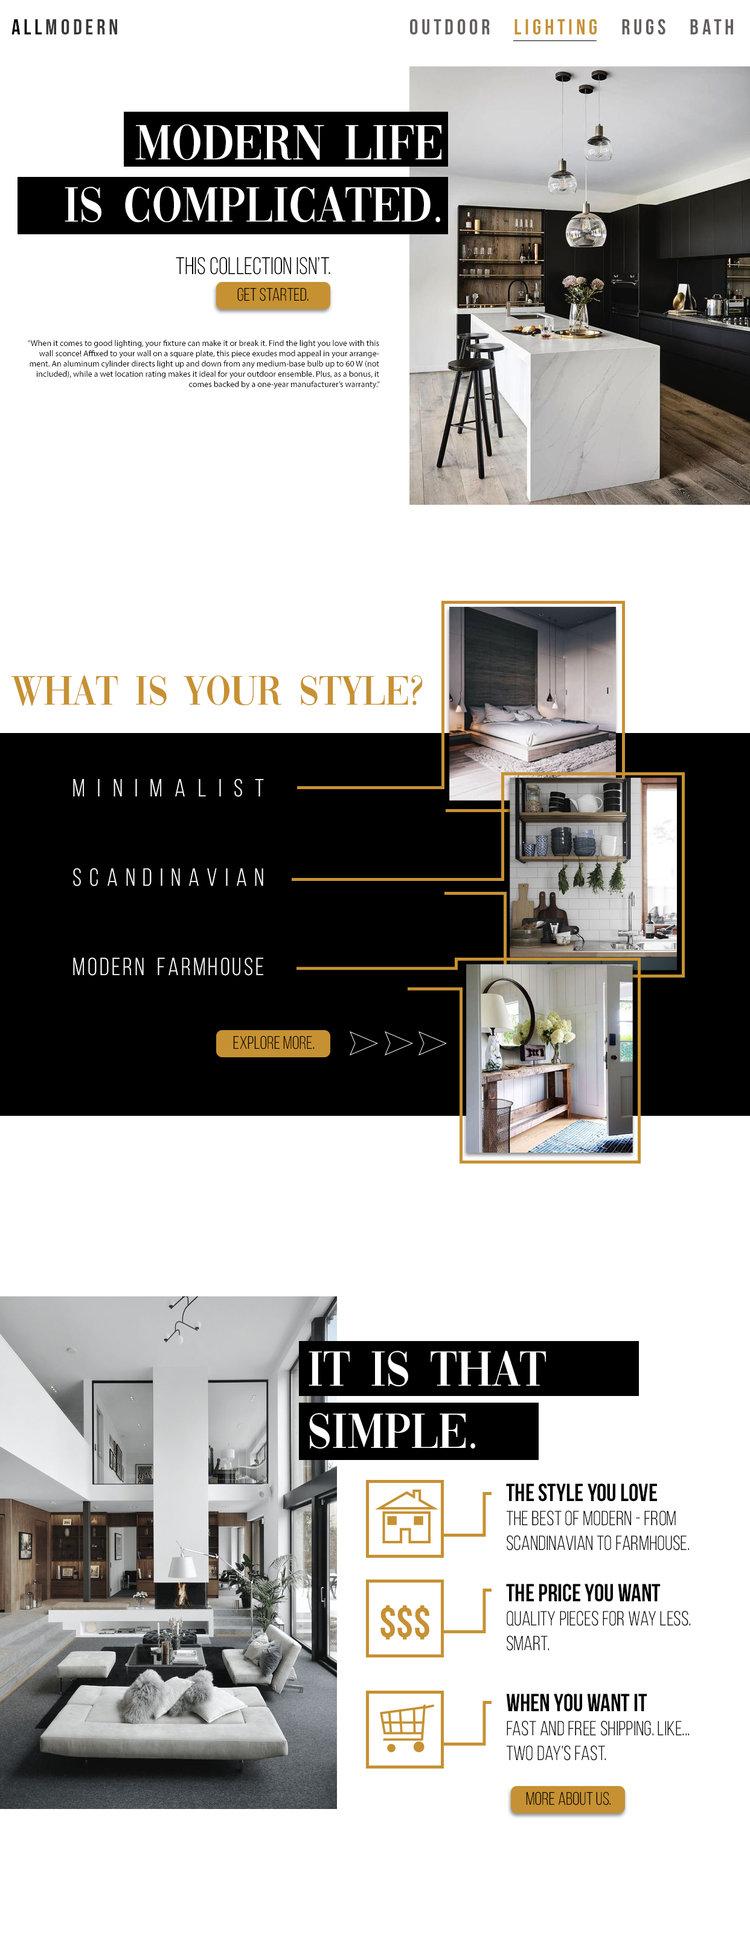 portfolio_allmodern.jpg